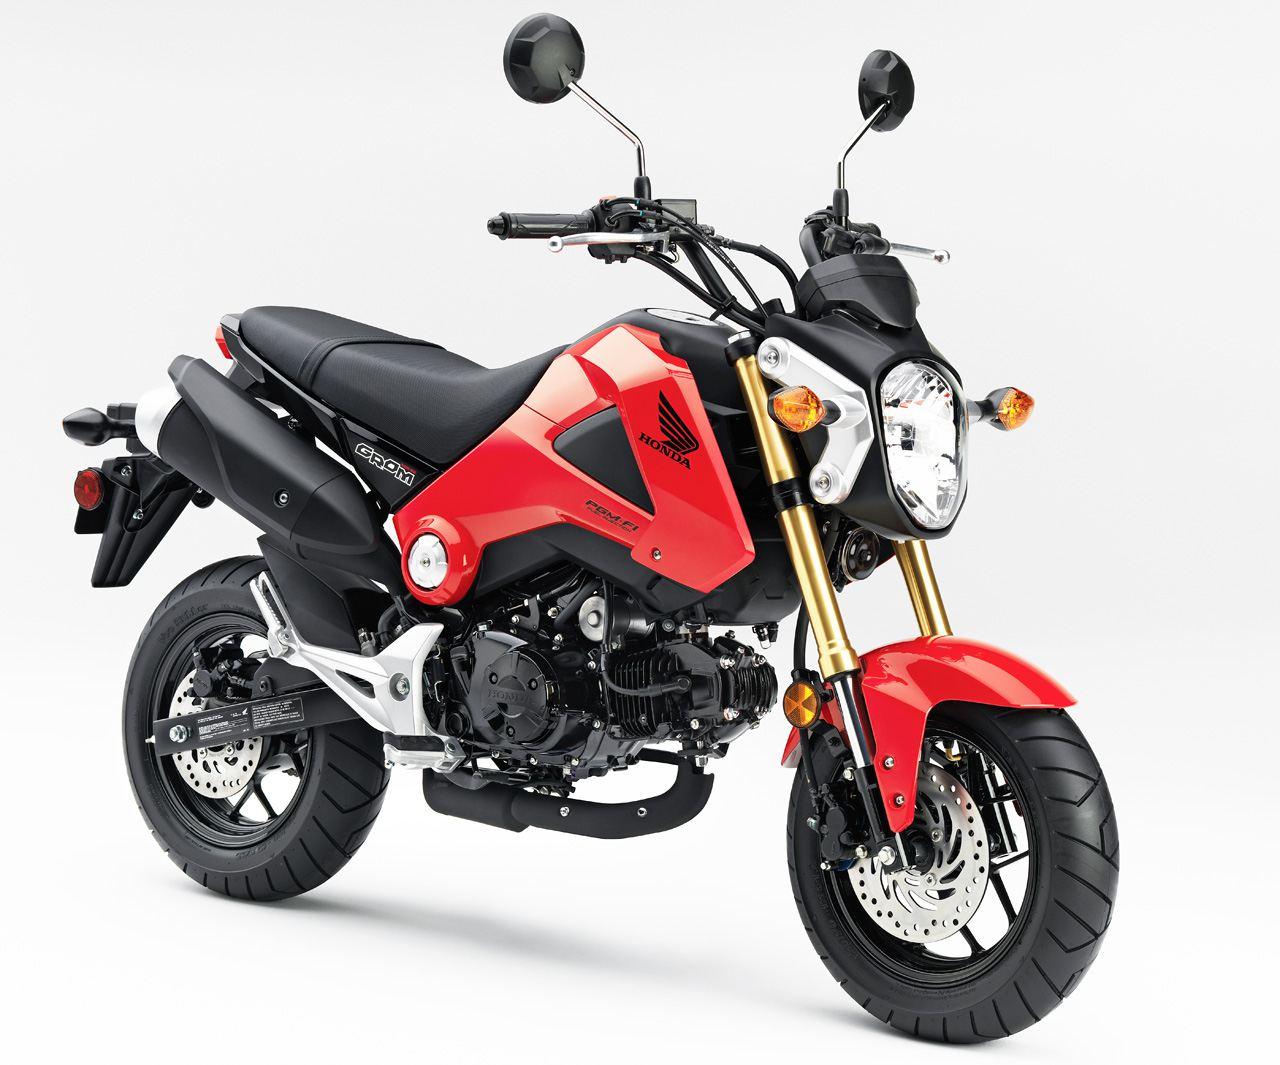 Top 10 Motorcycles For Beginners 2014 Honda 250cc Dirt Bike Grom